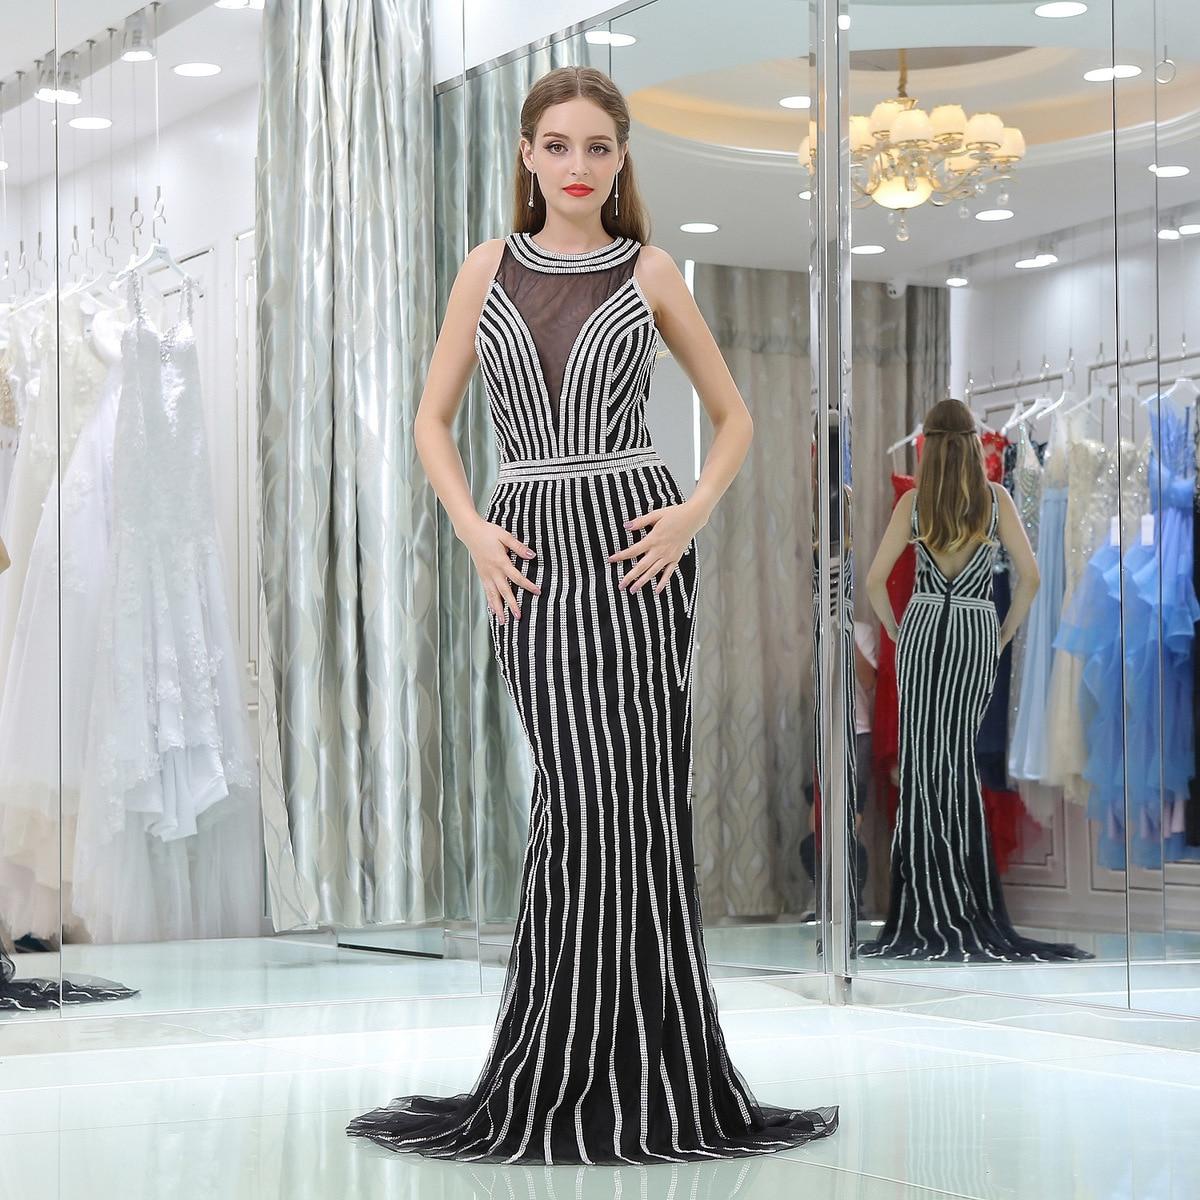 New Black Prom dresses Mermaid Vestidos de fiesta dress for graduation Beading Sweep Train Evening Prom Dress Two Pieces Gown